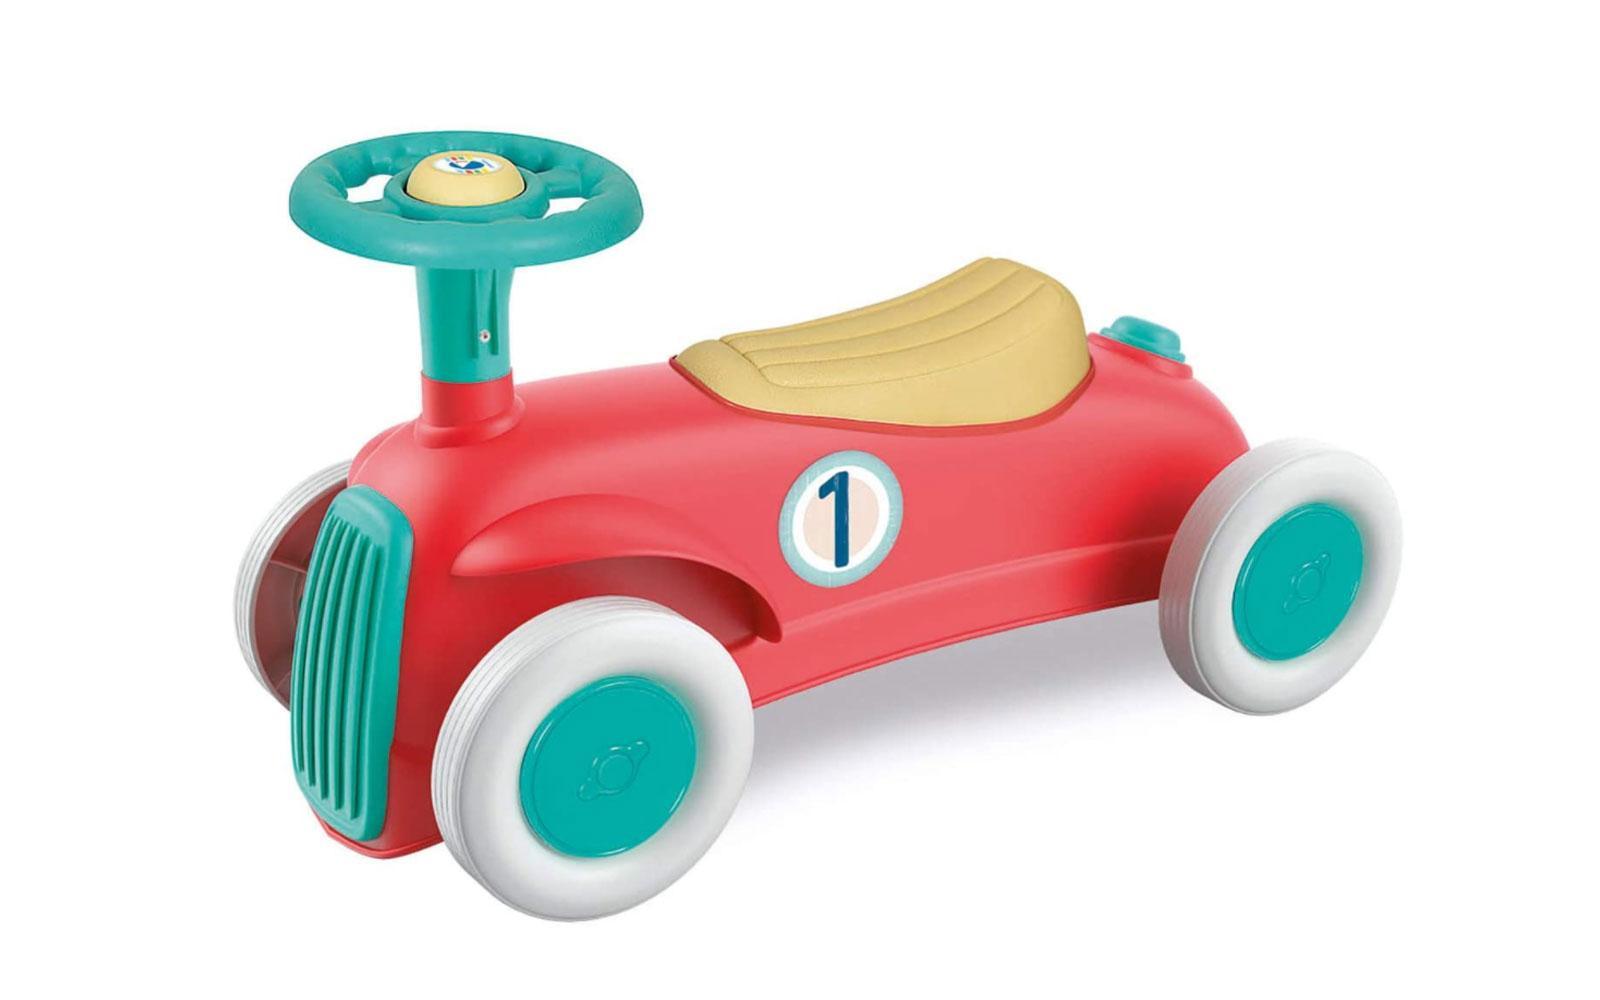 Avto poganjalec VINTAGE, Clementoni